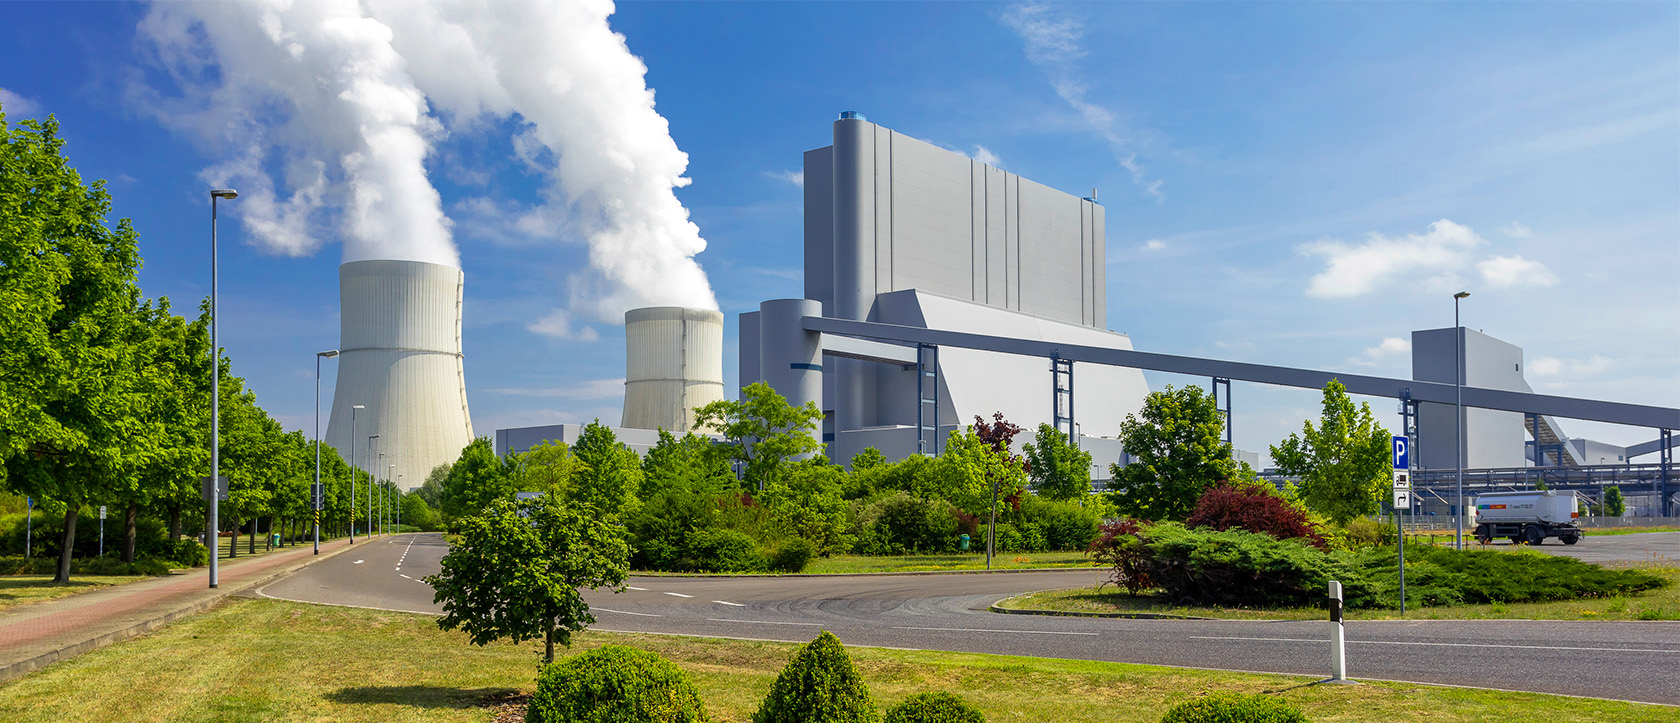 LEAG Kraftwerke | Energieerzeugung aus Braunkohlenkraftwerken